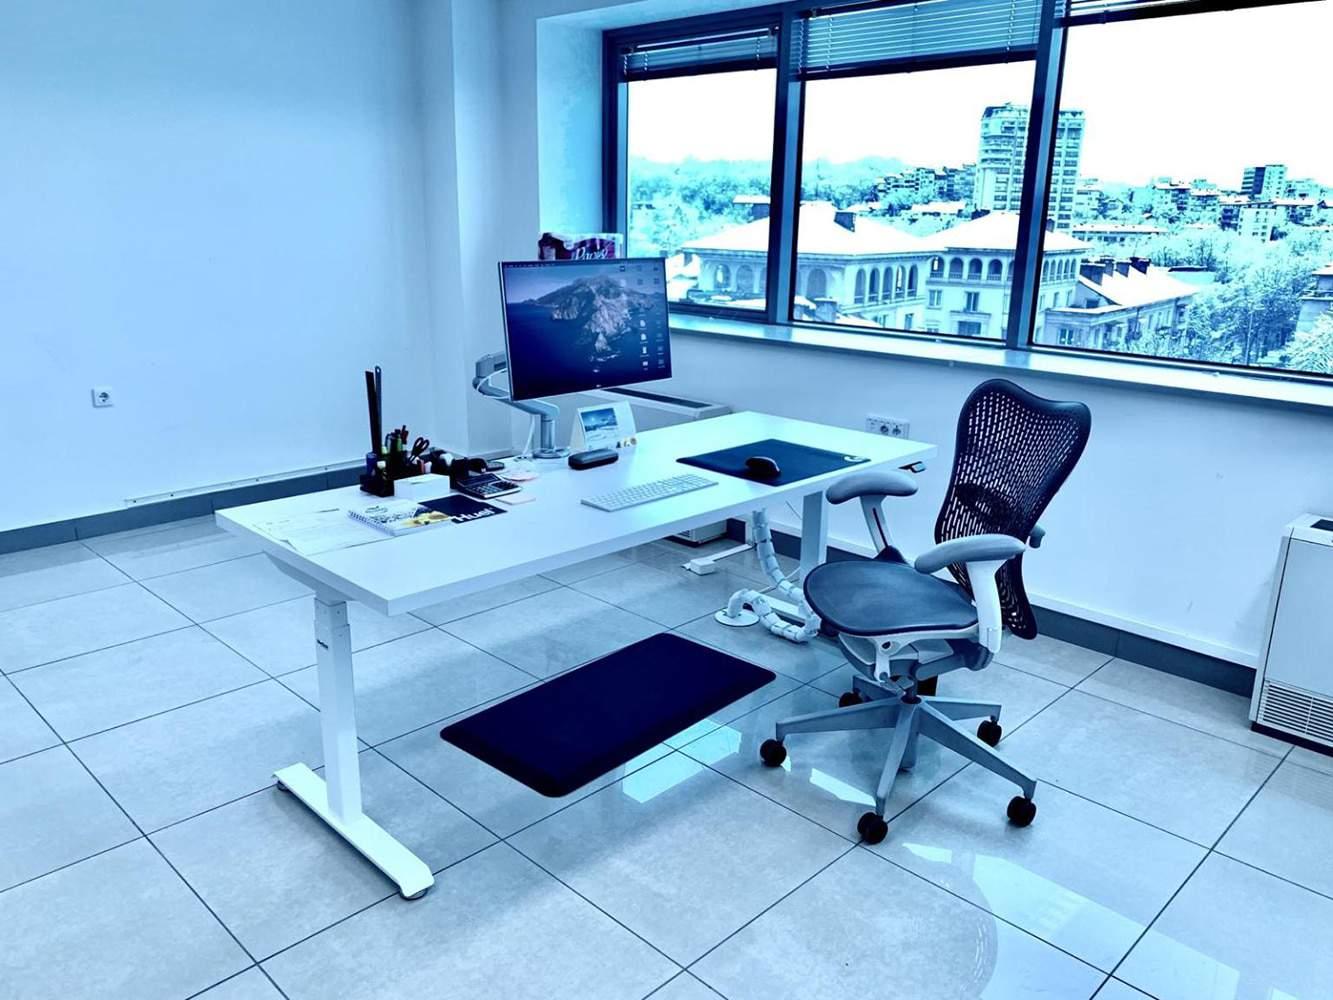 Standing desk BulDesk Pro 2 metre by 80 centimeters White